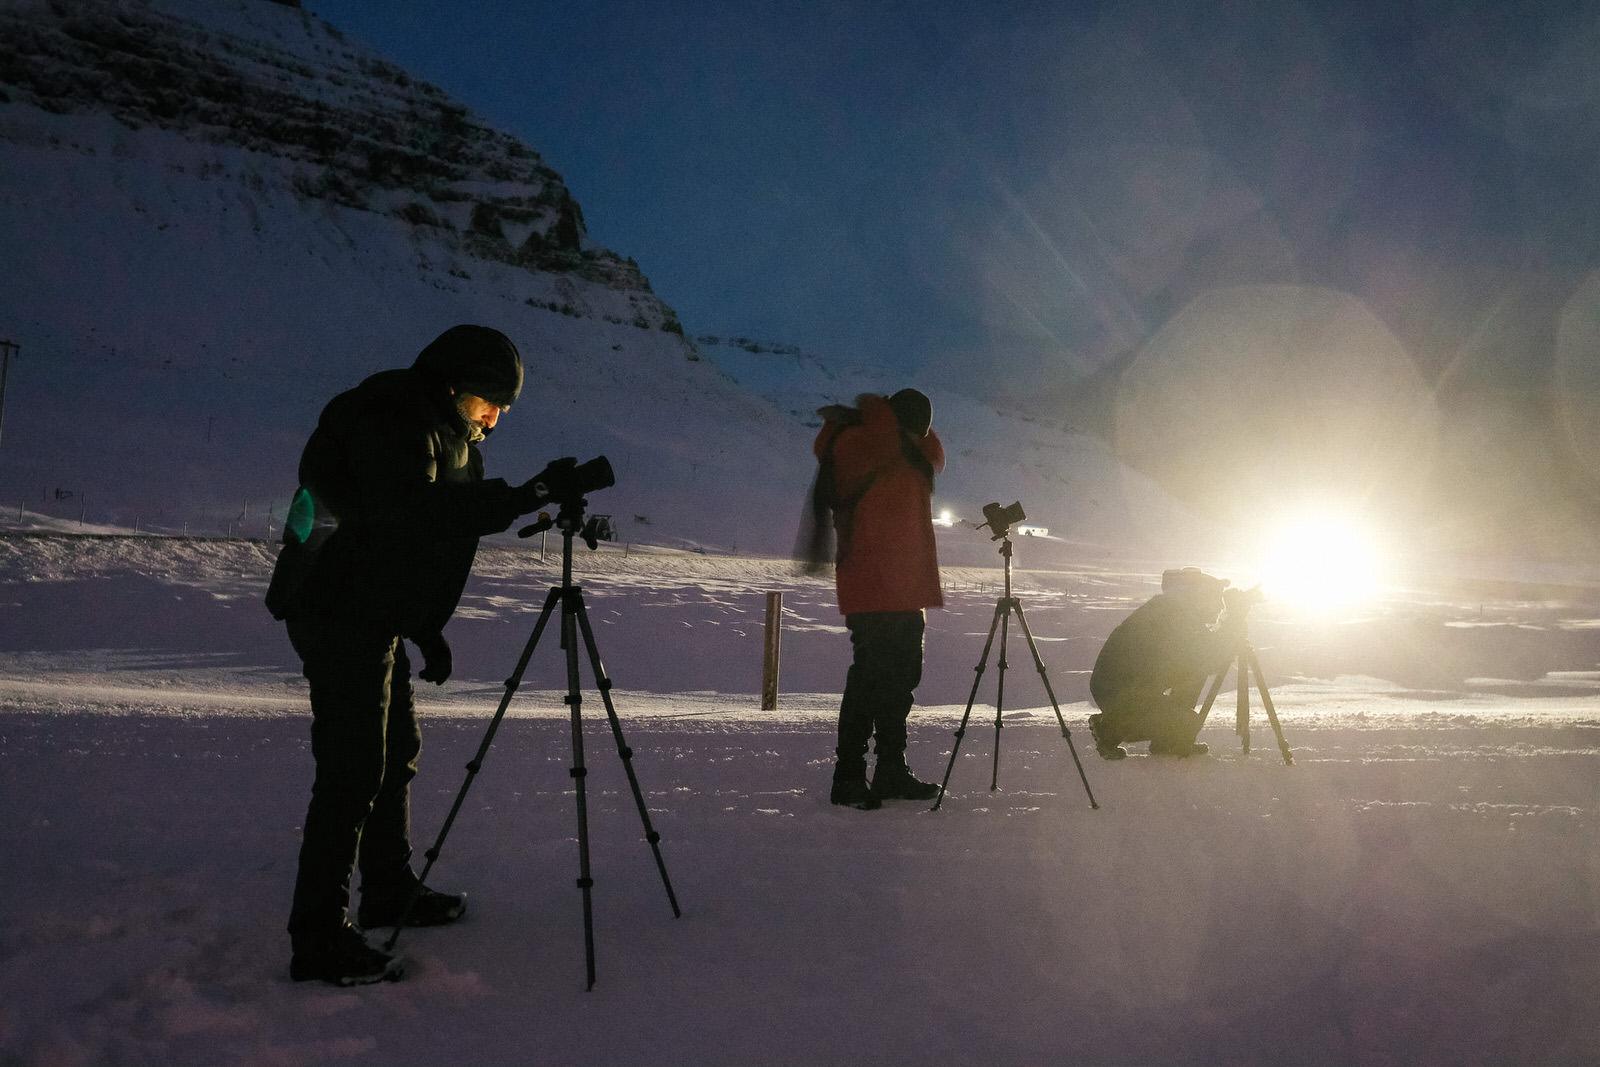 Collective_Wander_Iceland_Photographers_Trip_034.jpg